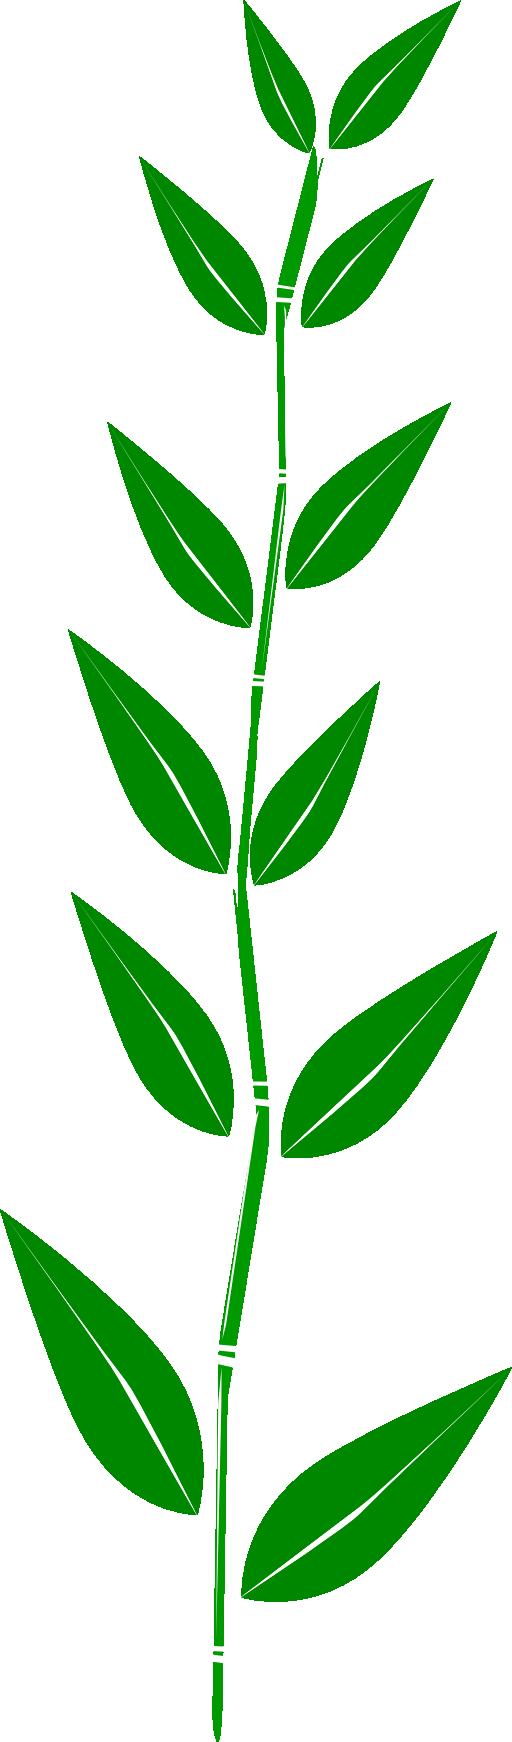 Leaf leaves clip art free vector 3